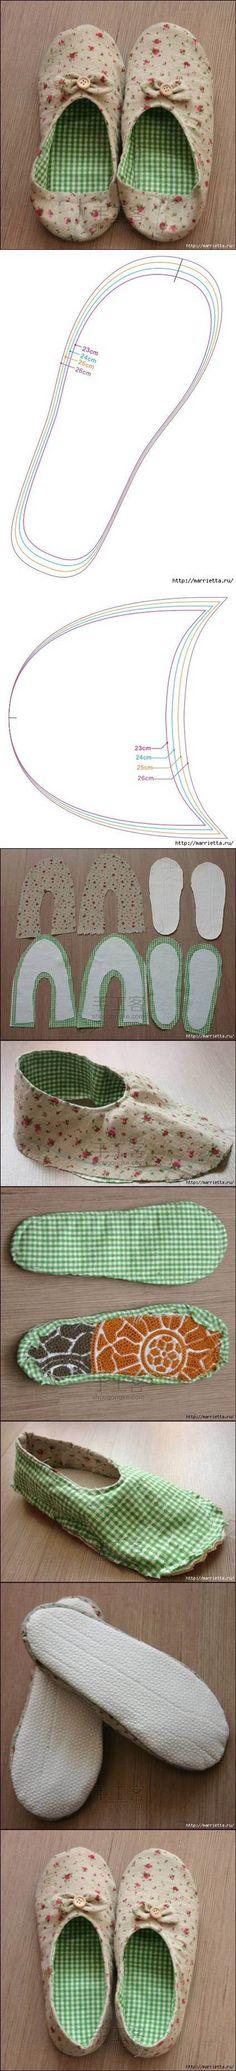 zapatillas | Manualidades Gratis